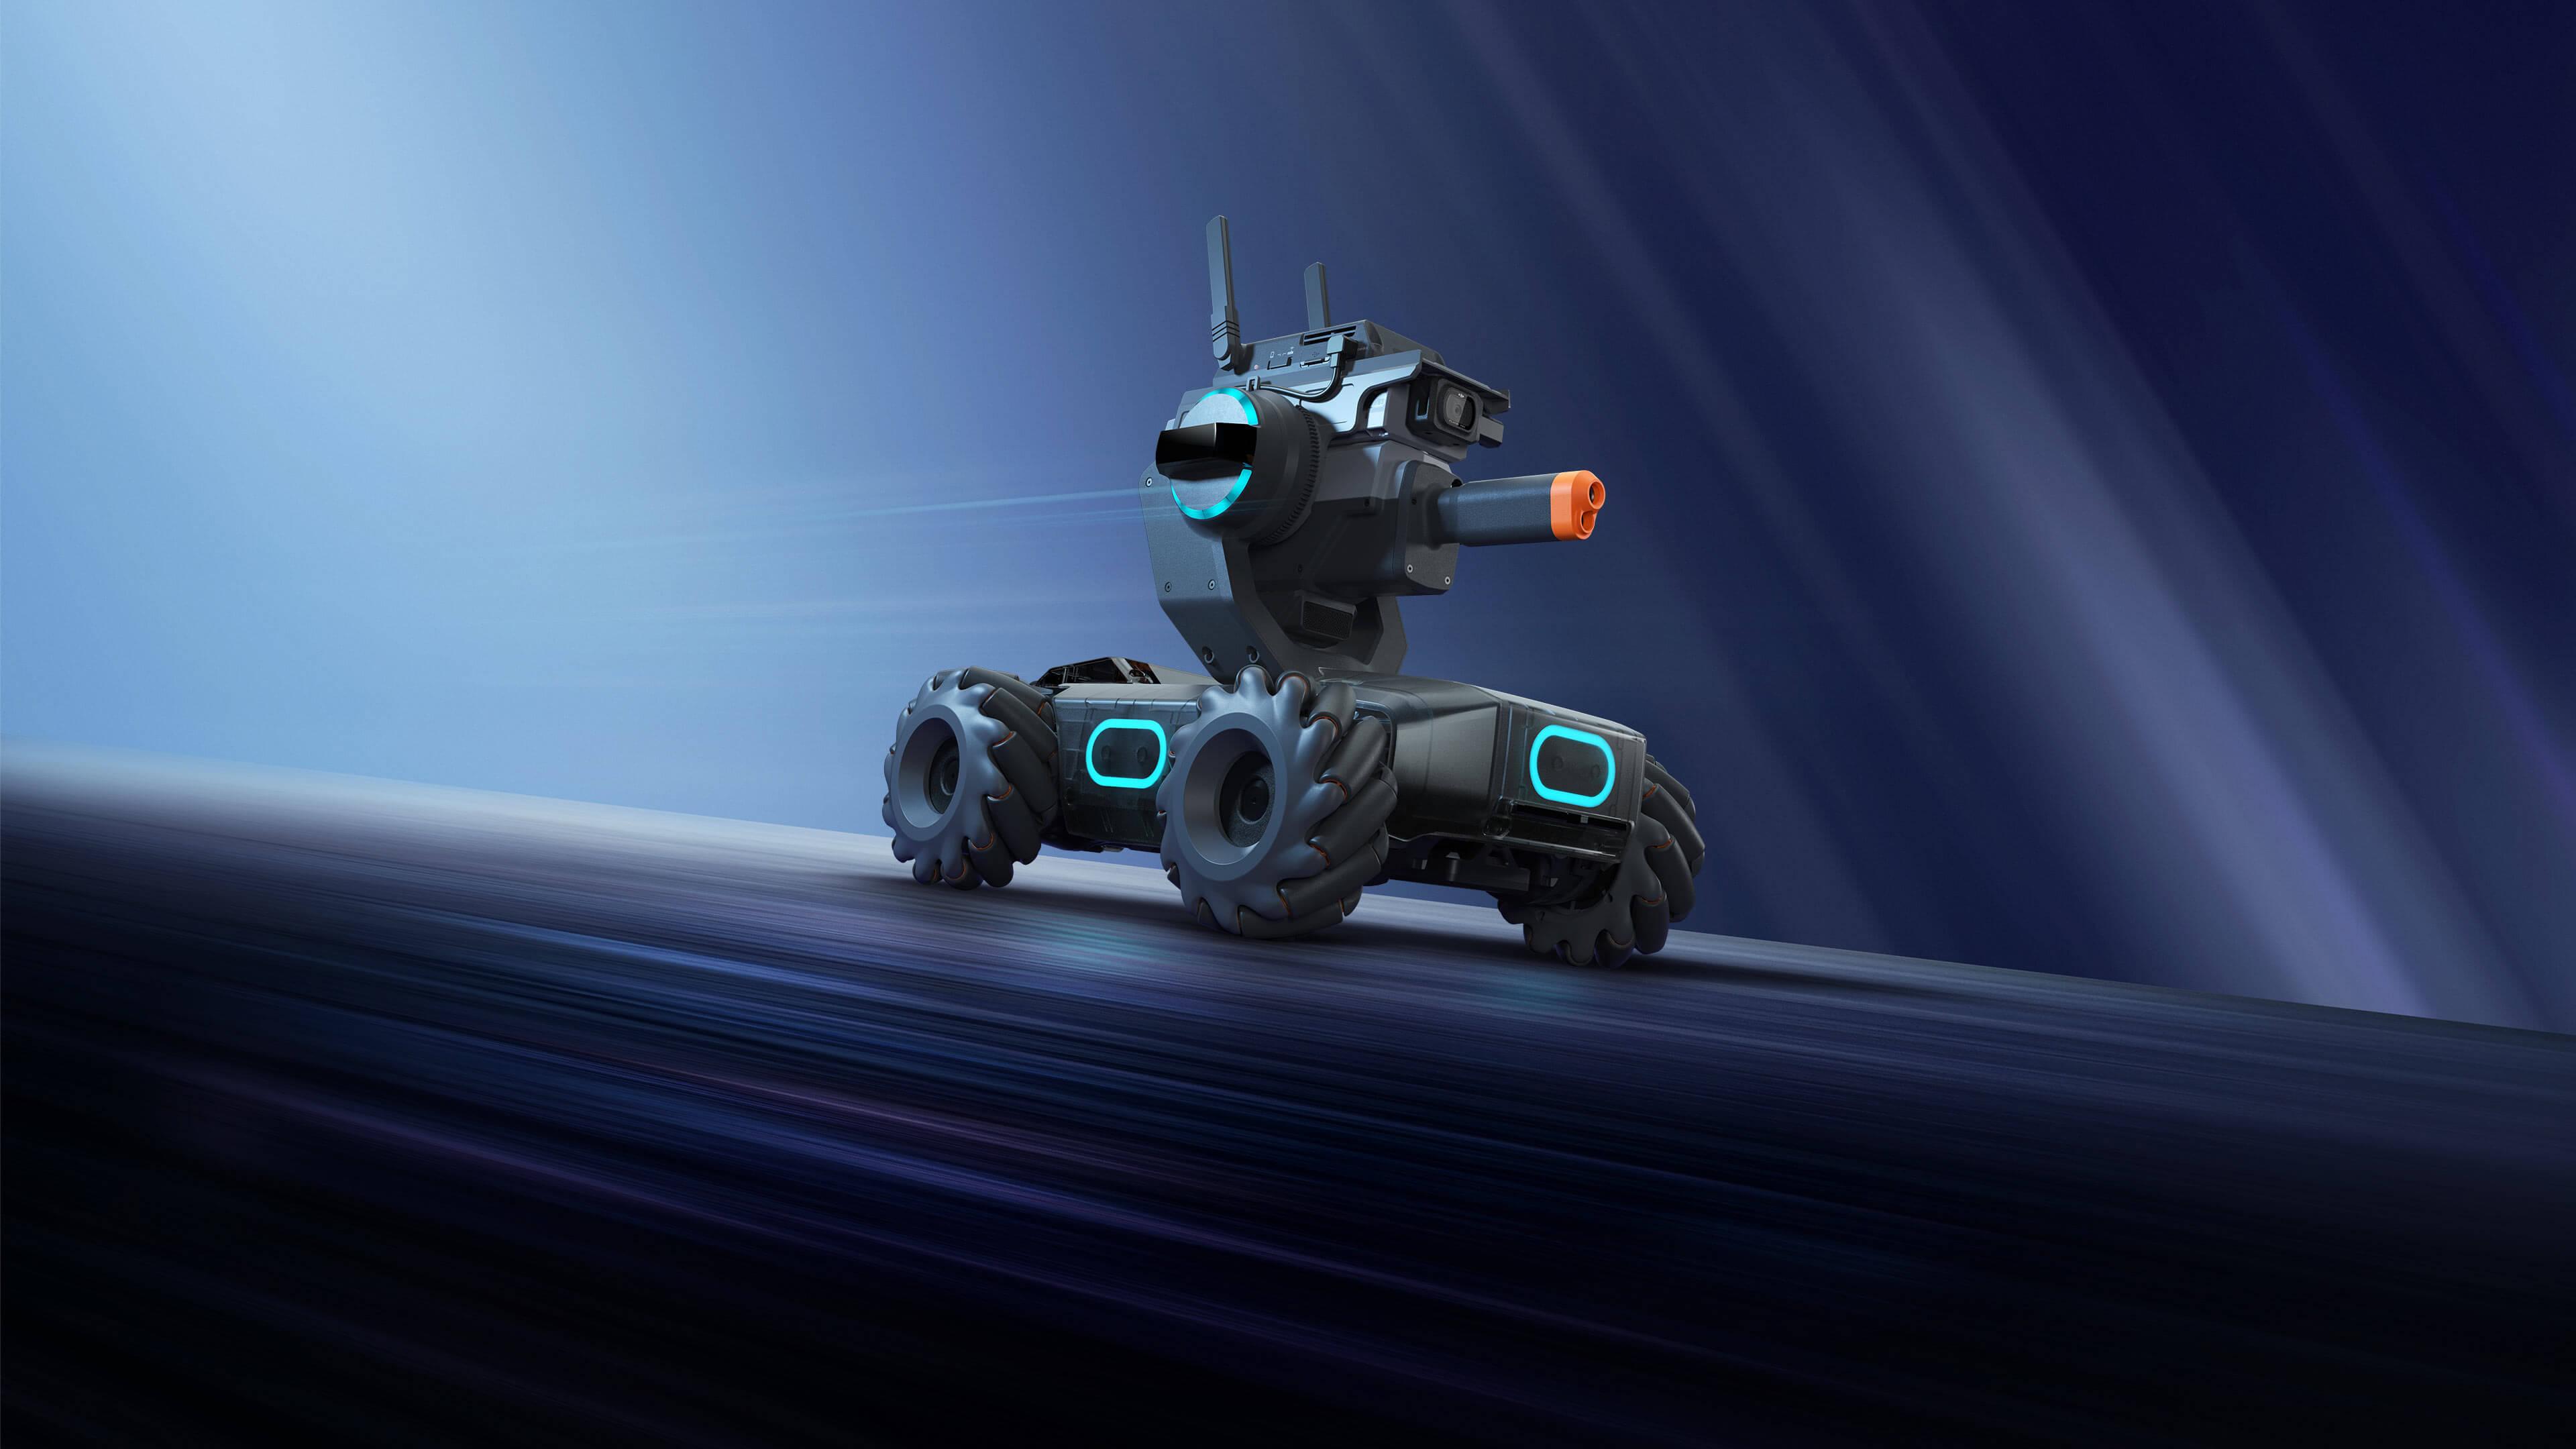 Robot edukacyjny RoboMaster S1